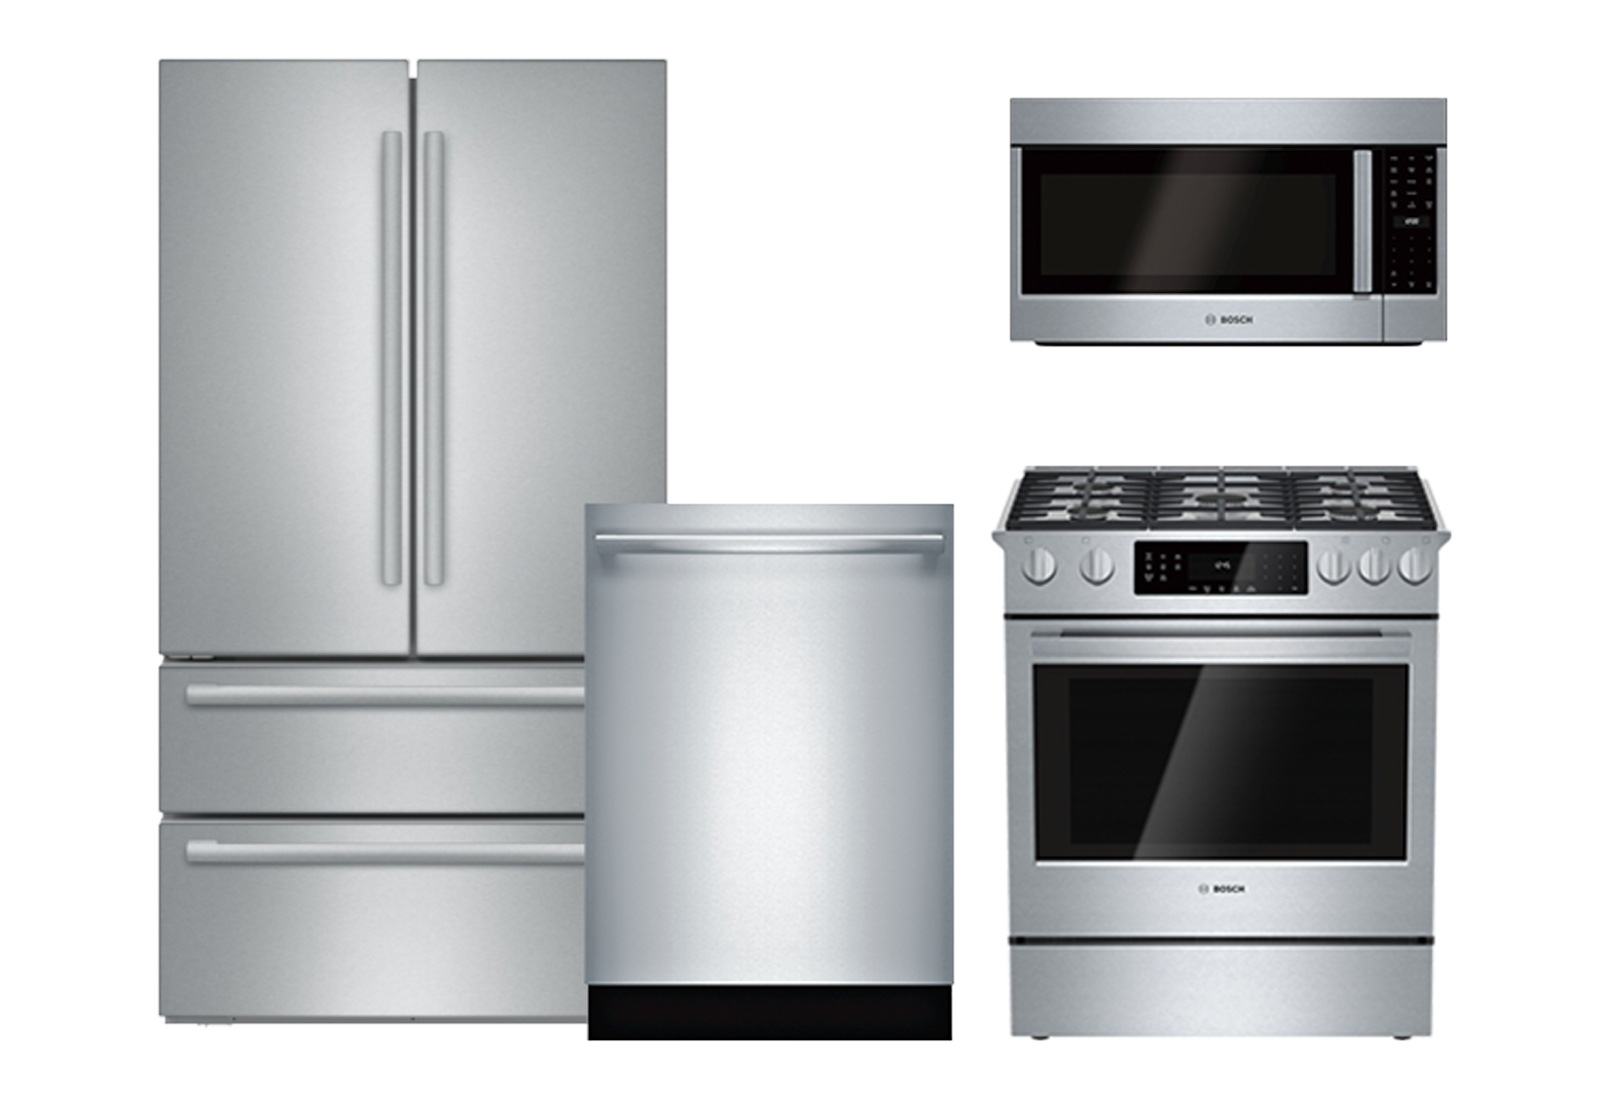 Bosch Save Up To 12 Percent Ginno S Kitchen Appliance